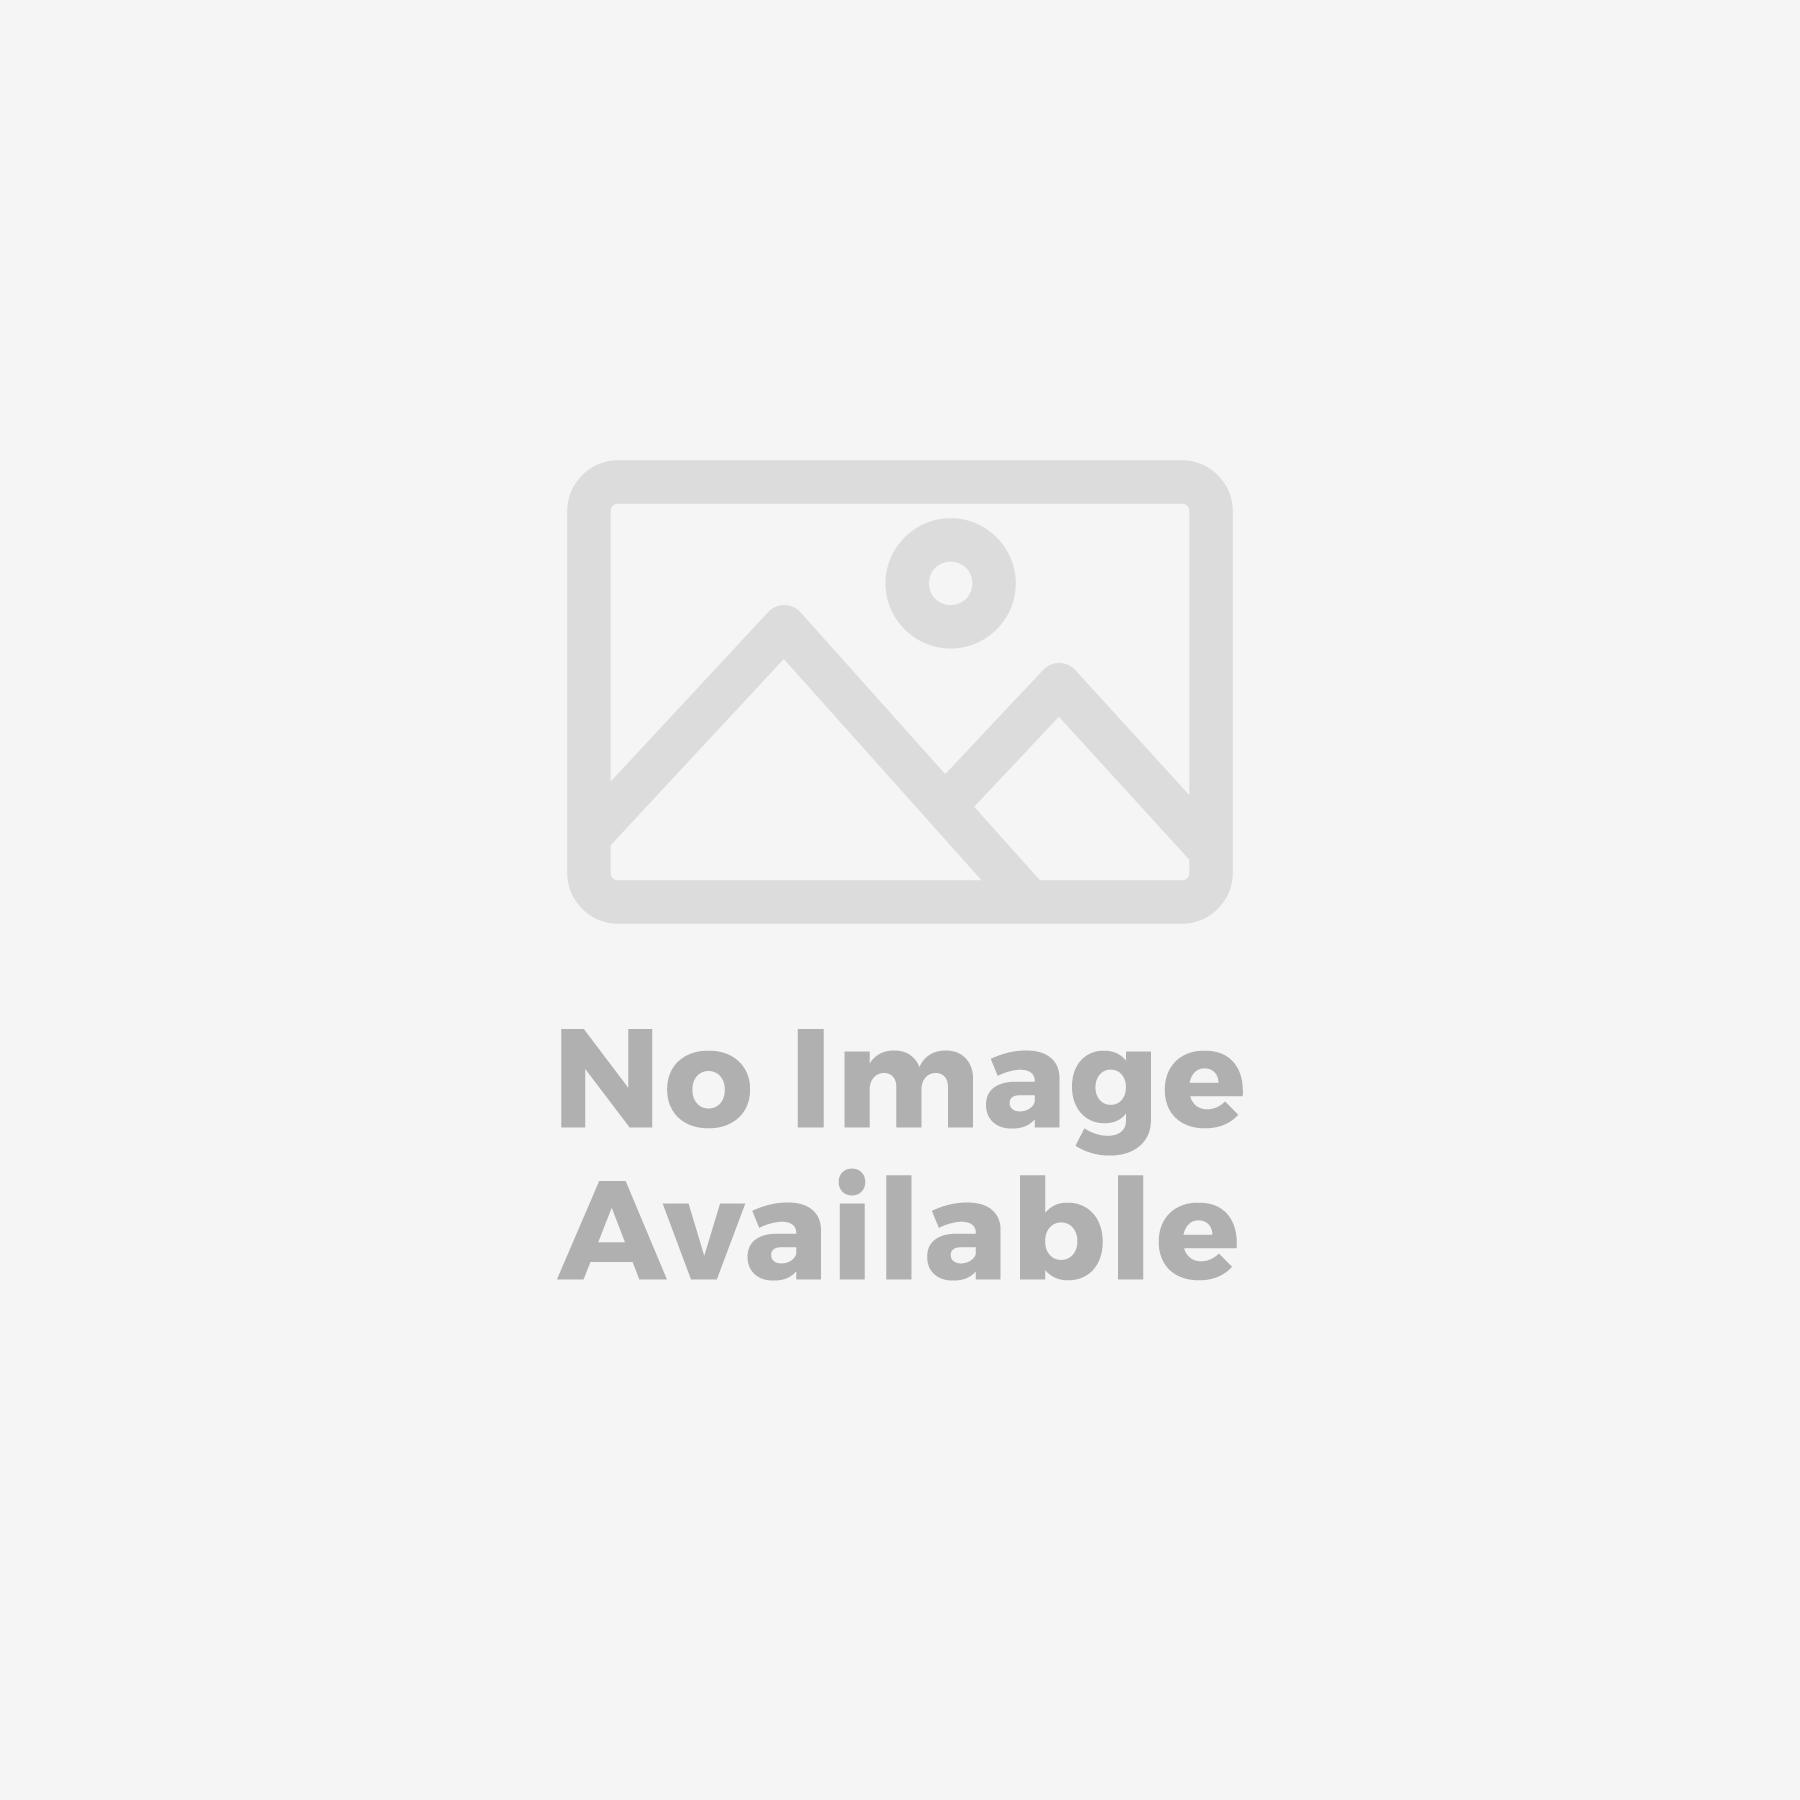 NORONHA ROUND BAR TABLE